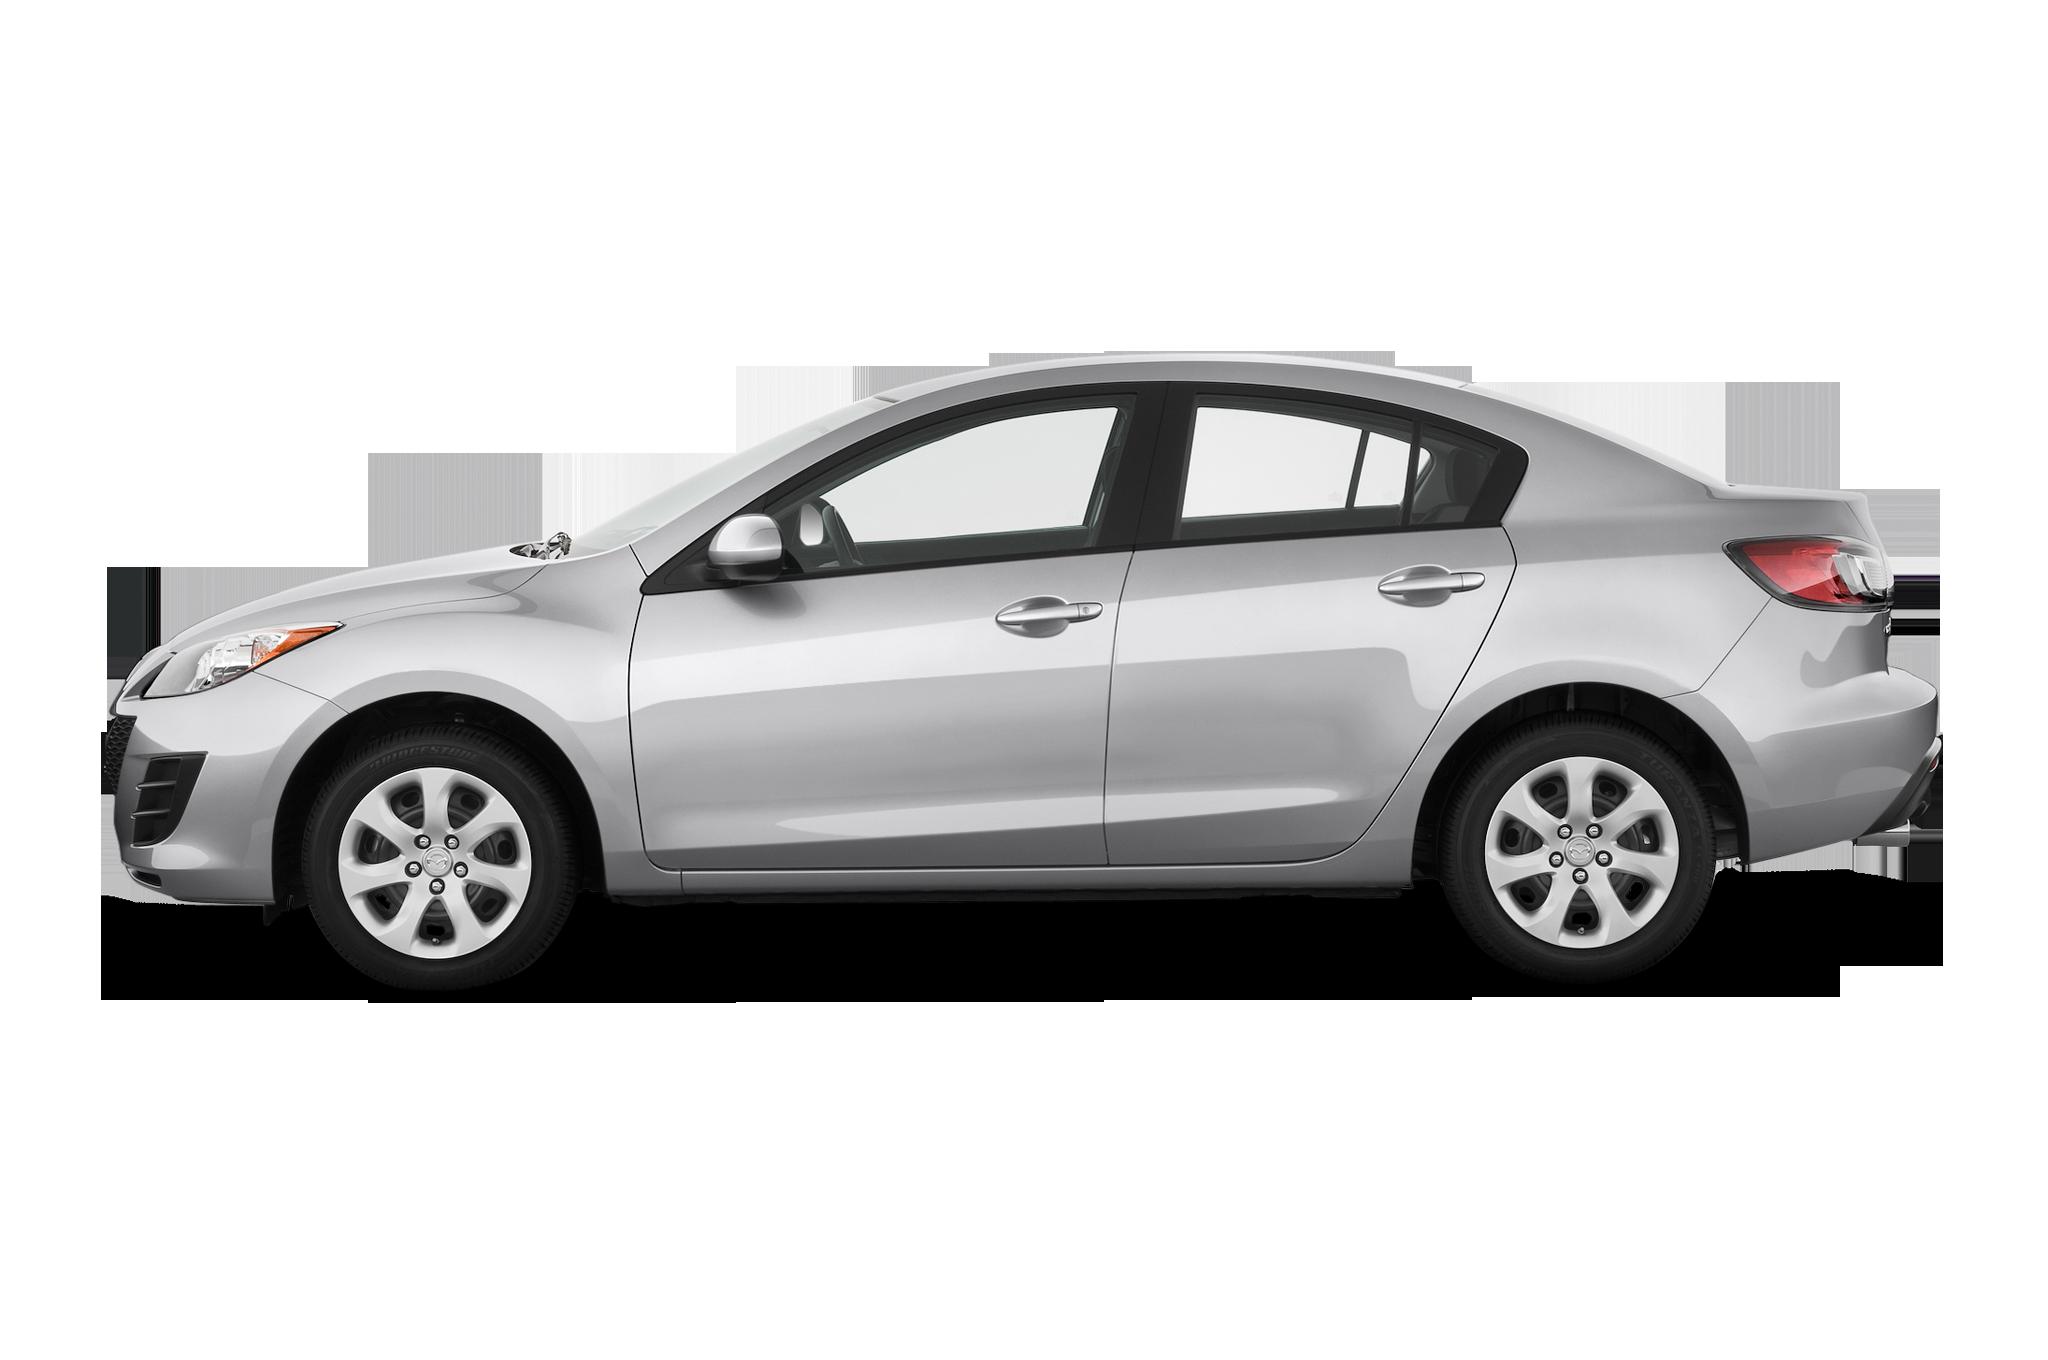 2010 Mazda 3 - Mazda Hatchback Review - Automobile Magazine